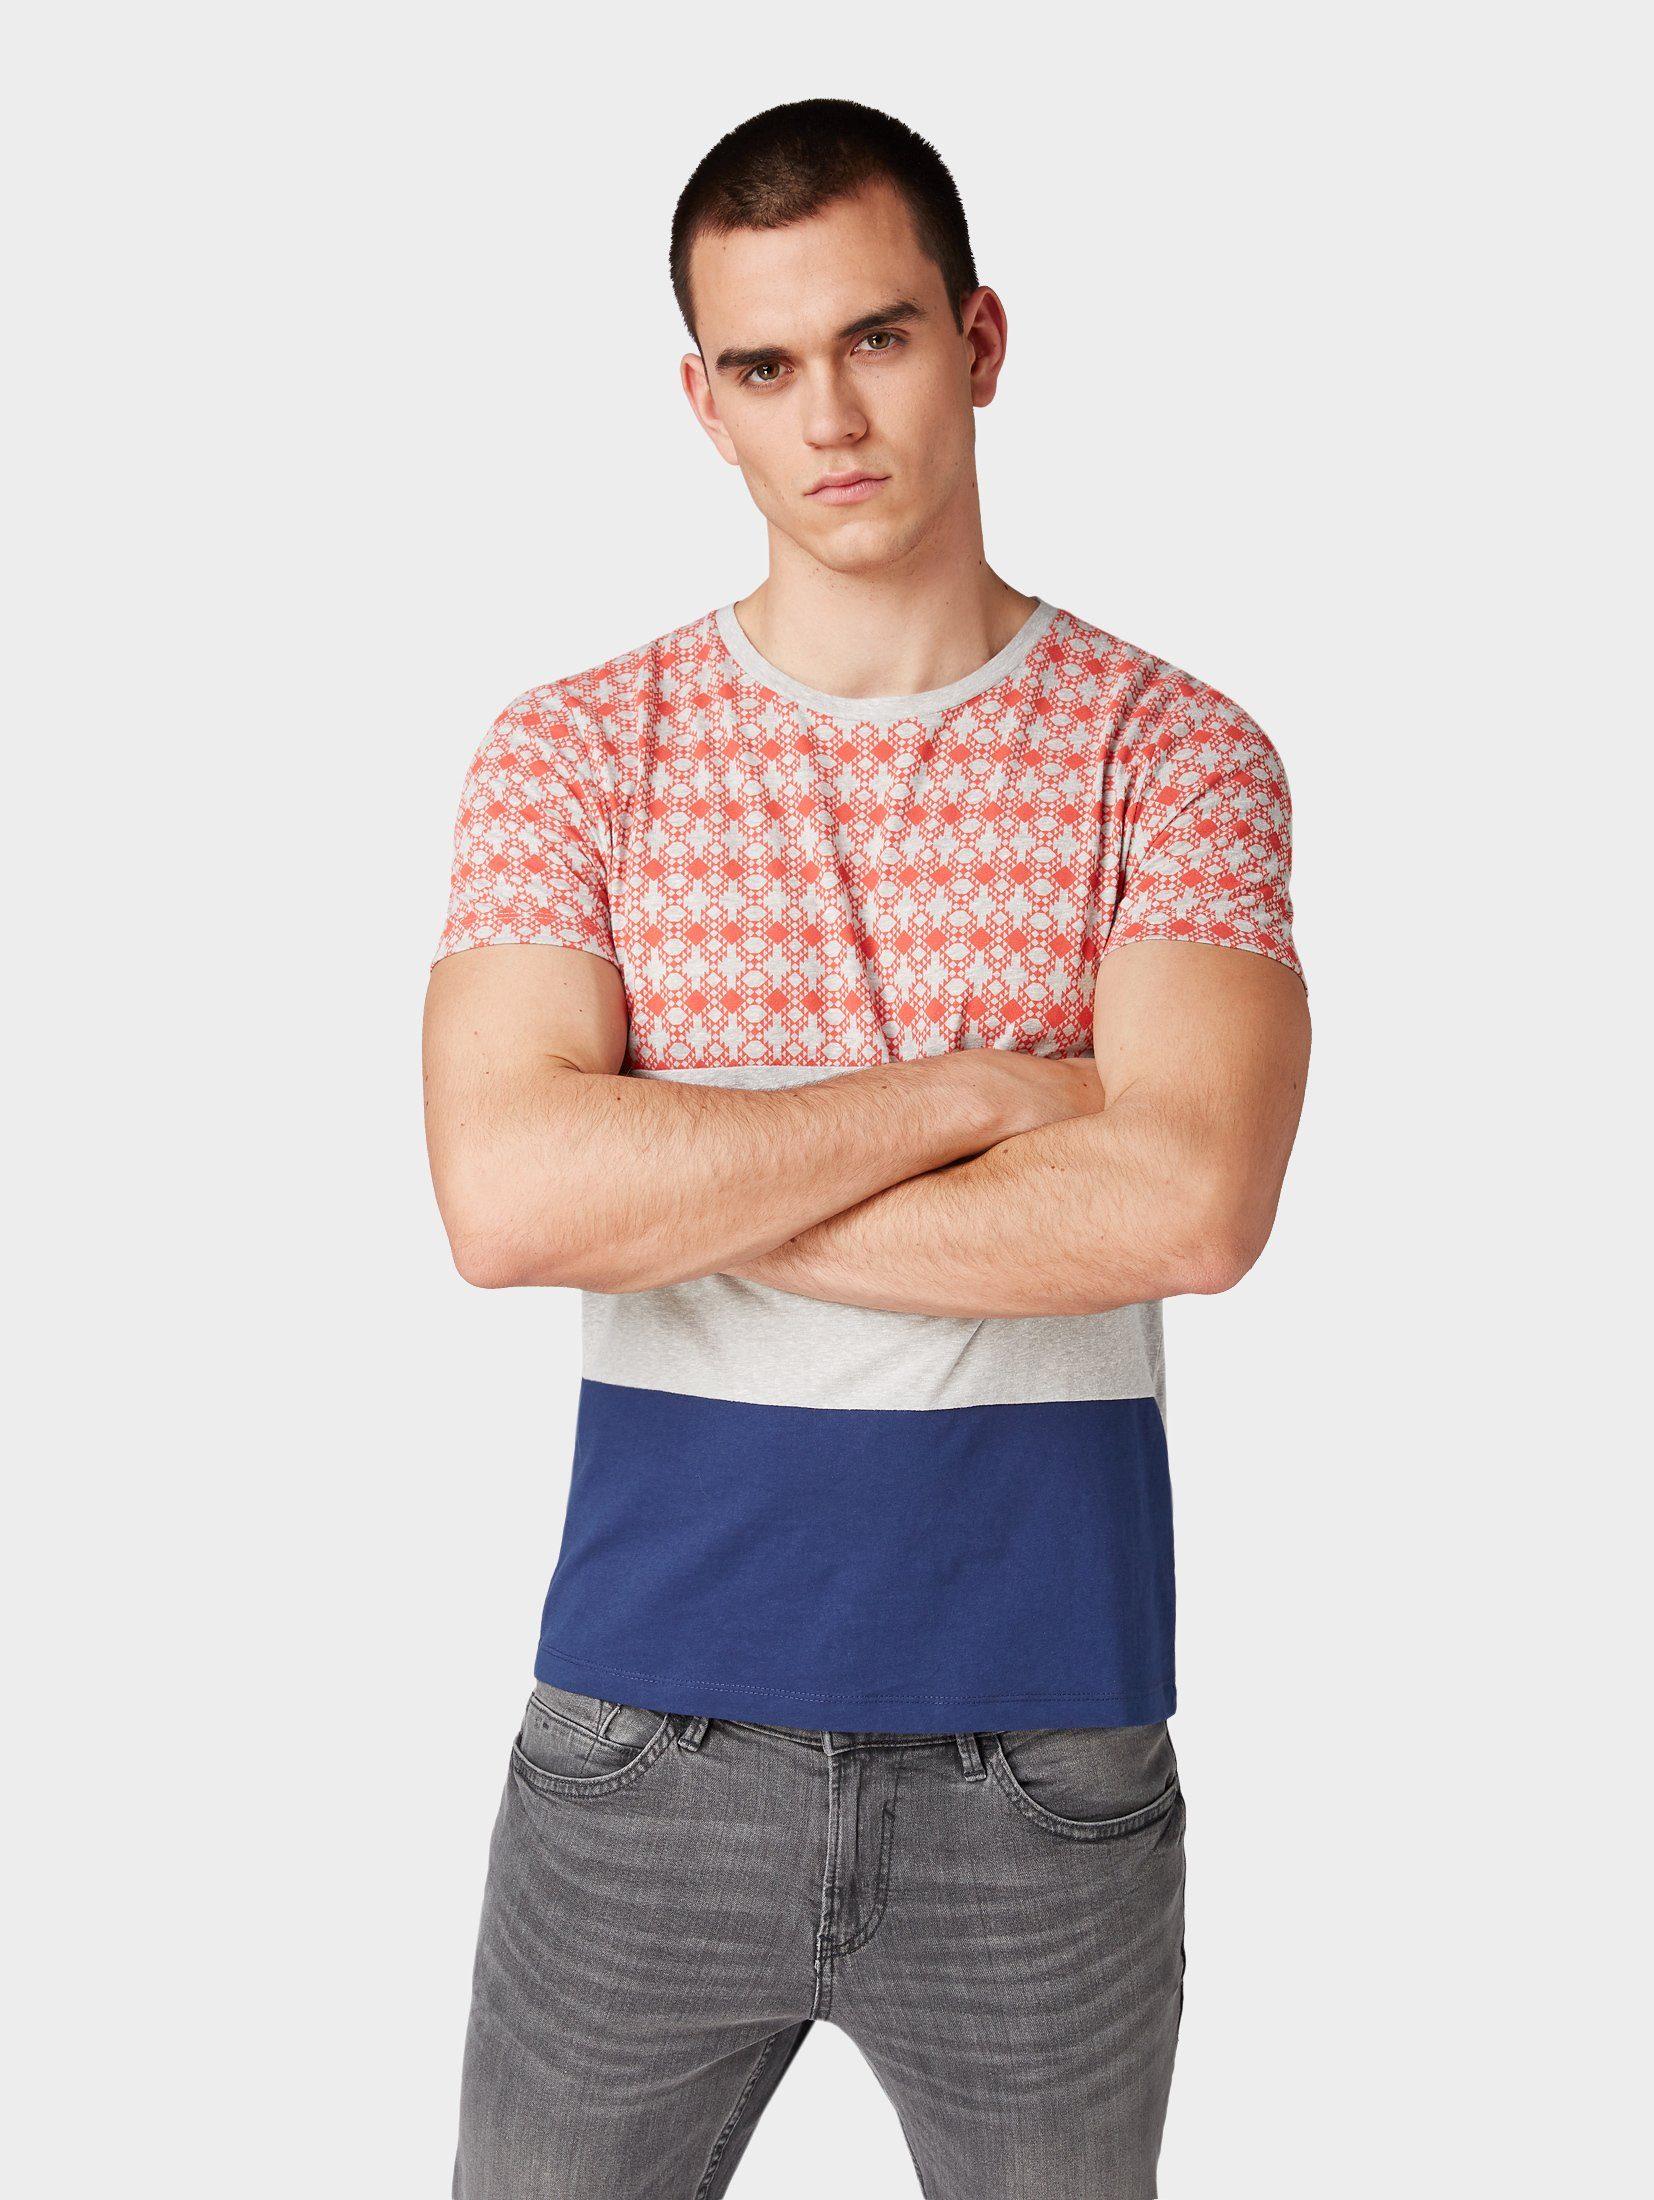 TOM TAILOR Denim T-Shirt »T-Shirt mit Musterung«